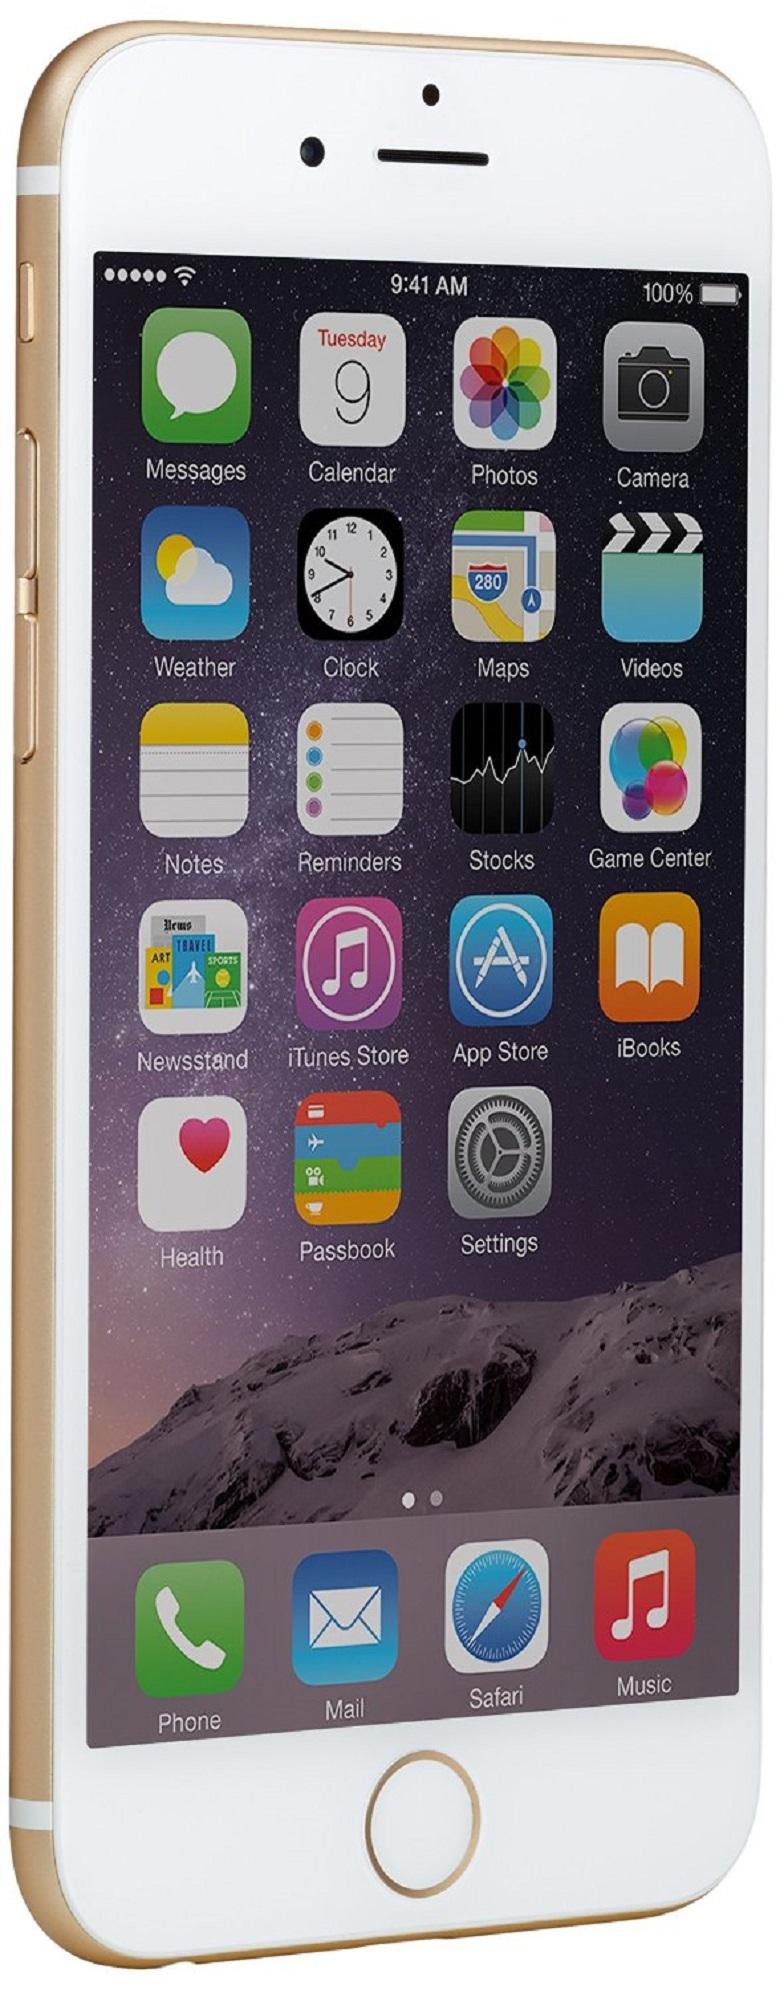 Apple iPhone 6, Gold, 64 GB (Unlocked), apple iphone 6, apple iphone, fathers day gift, fathers day present